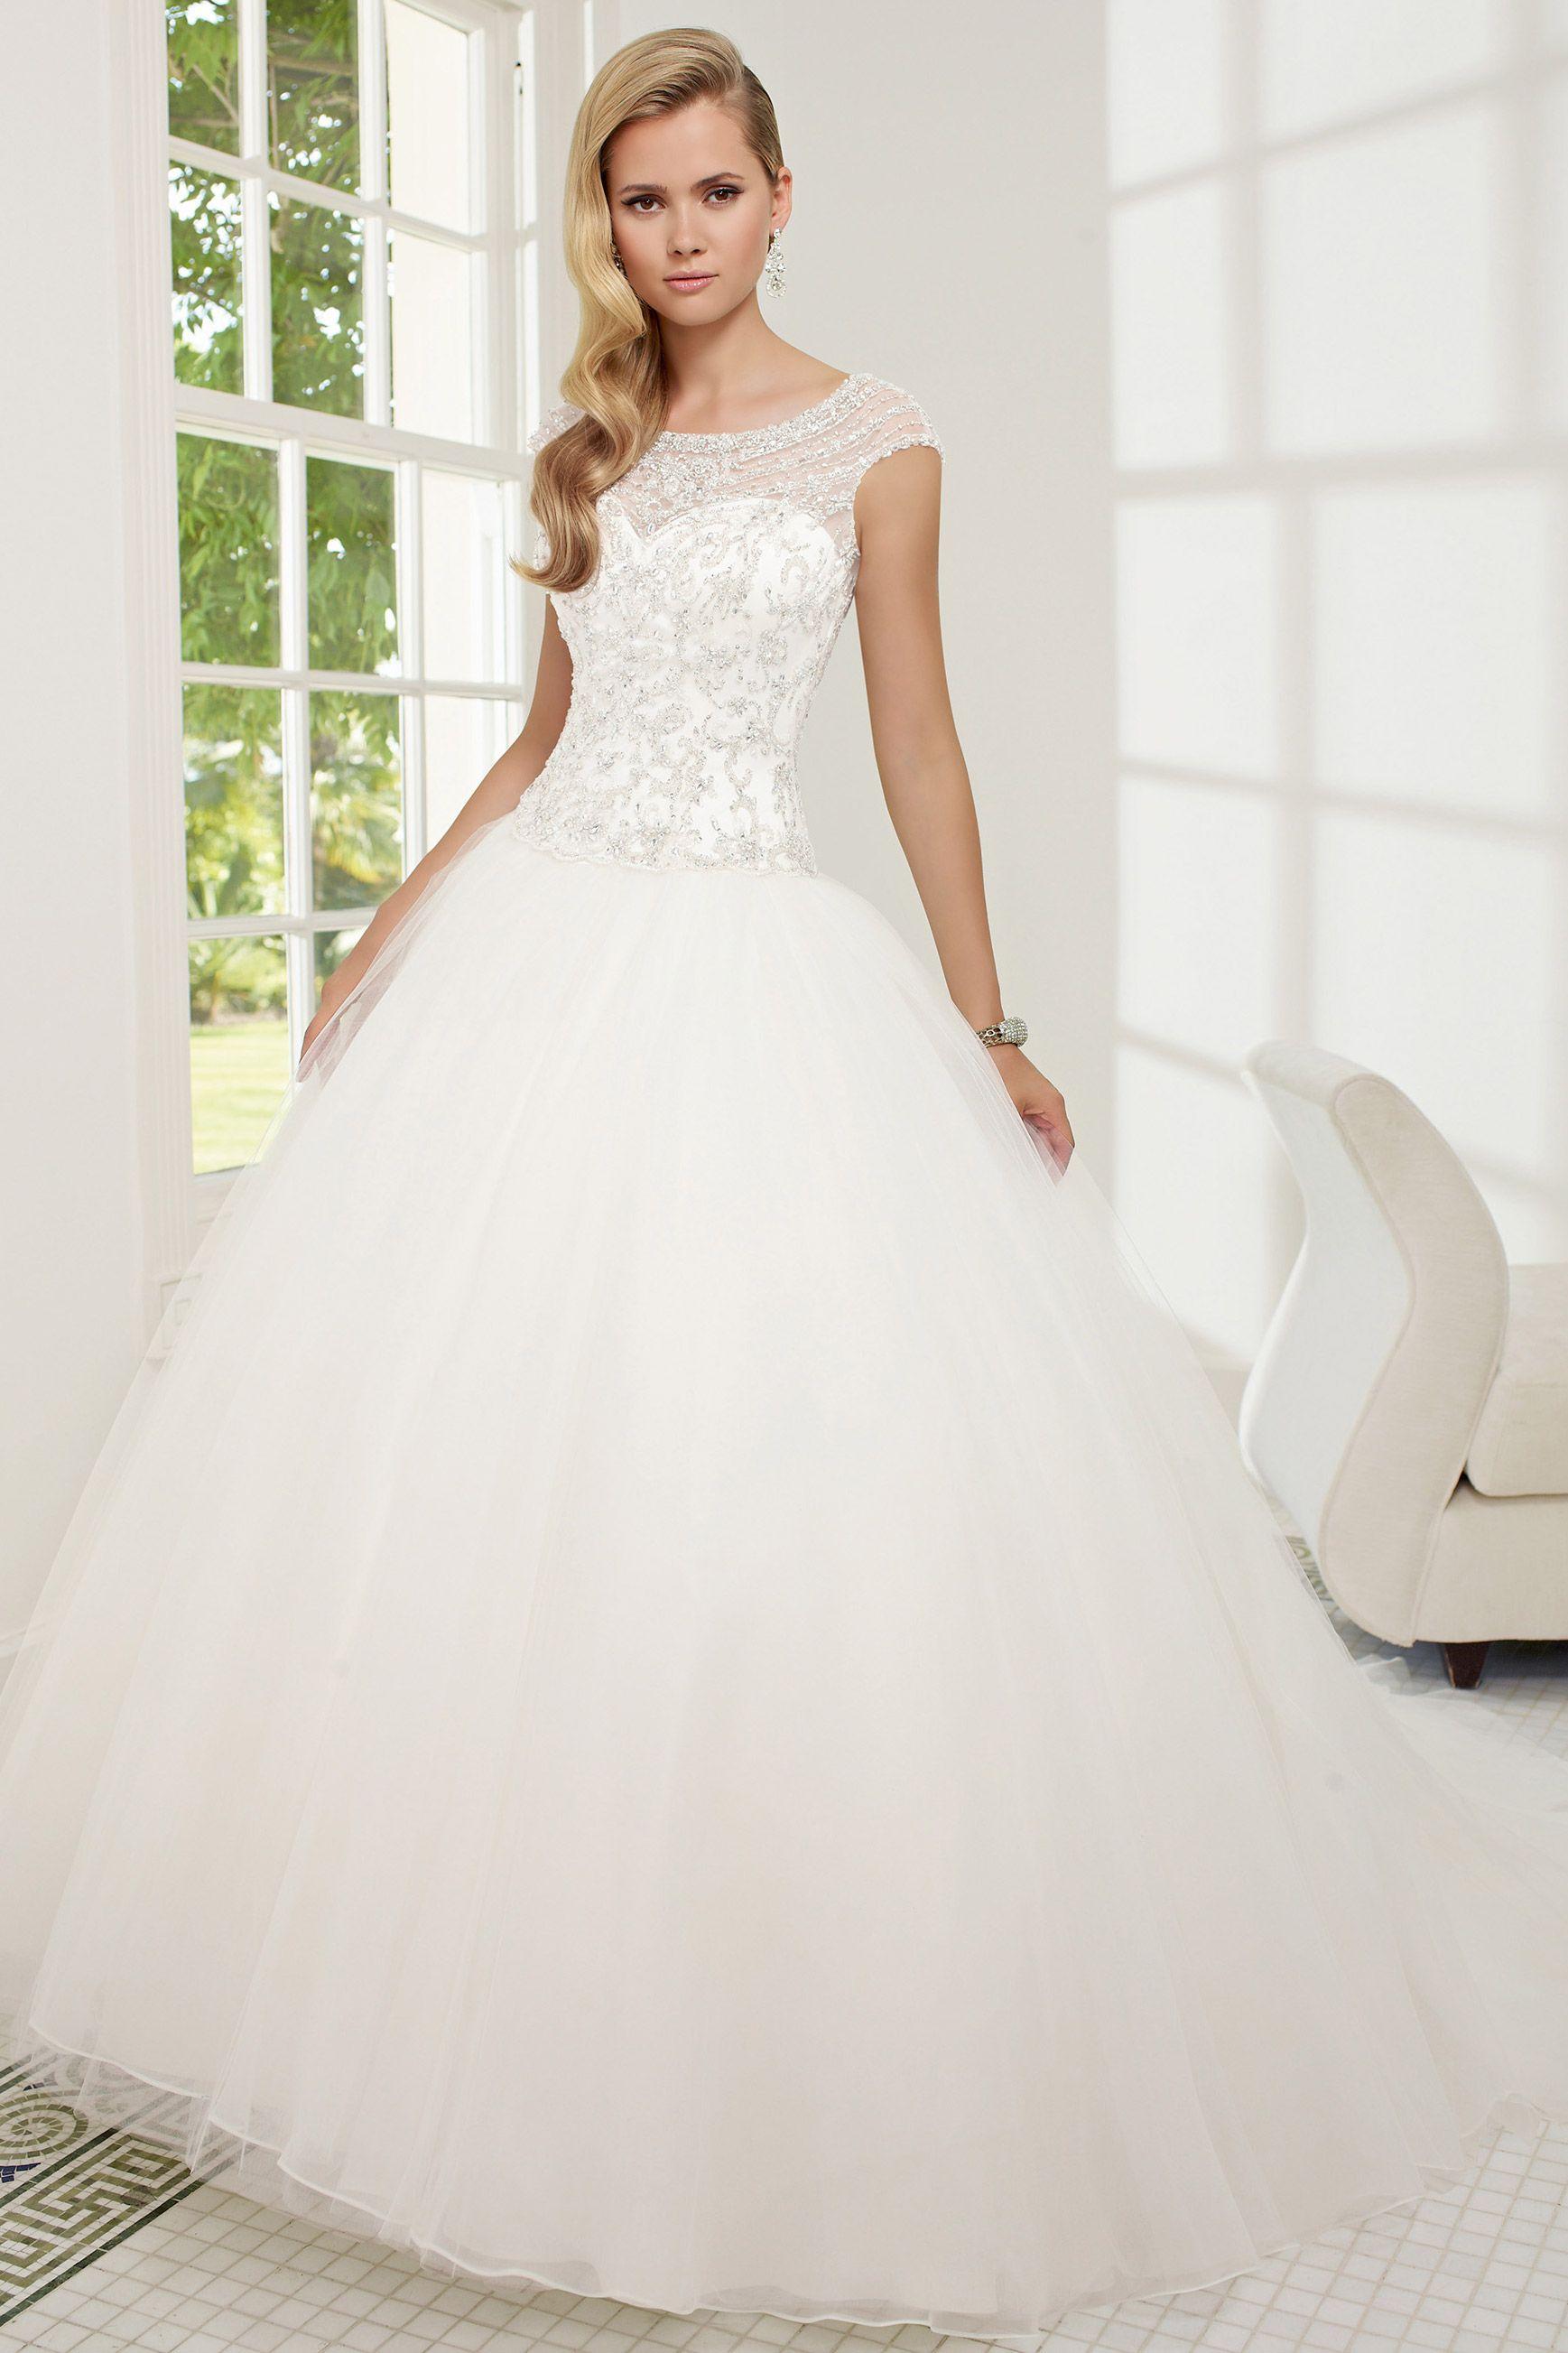 Ronald Joyce Ballgown Princess Wedding Dress Guides For Brides Wedding Dresses Wedding Dresses Beaded Wedding Dress Guide [ 2606 x 1737 Pixel ]